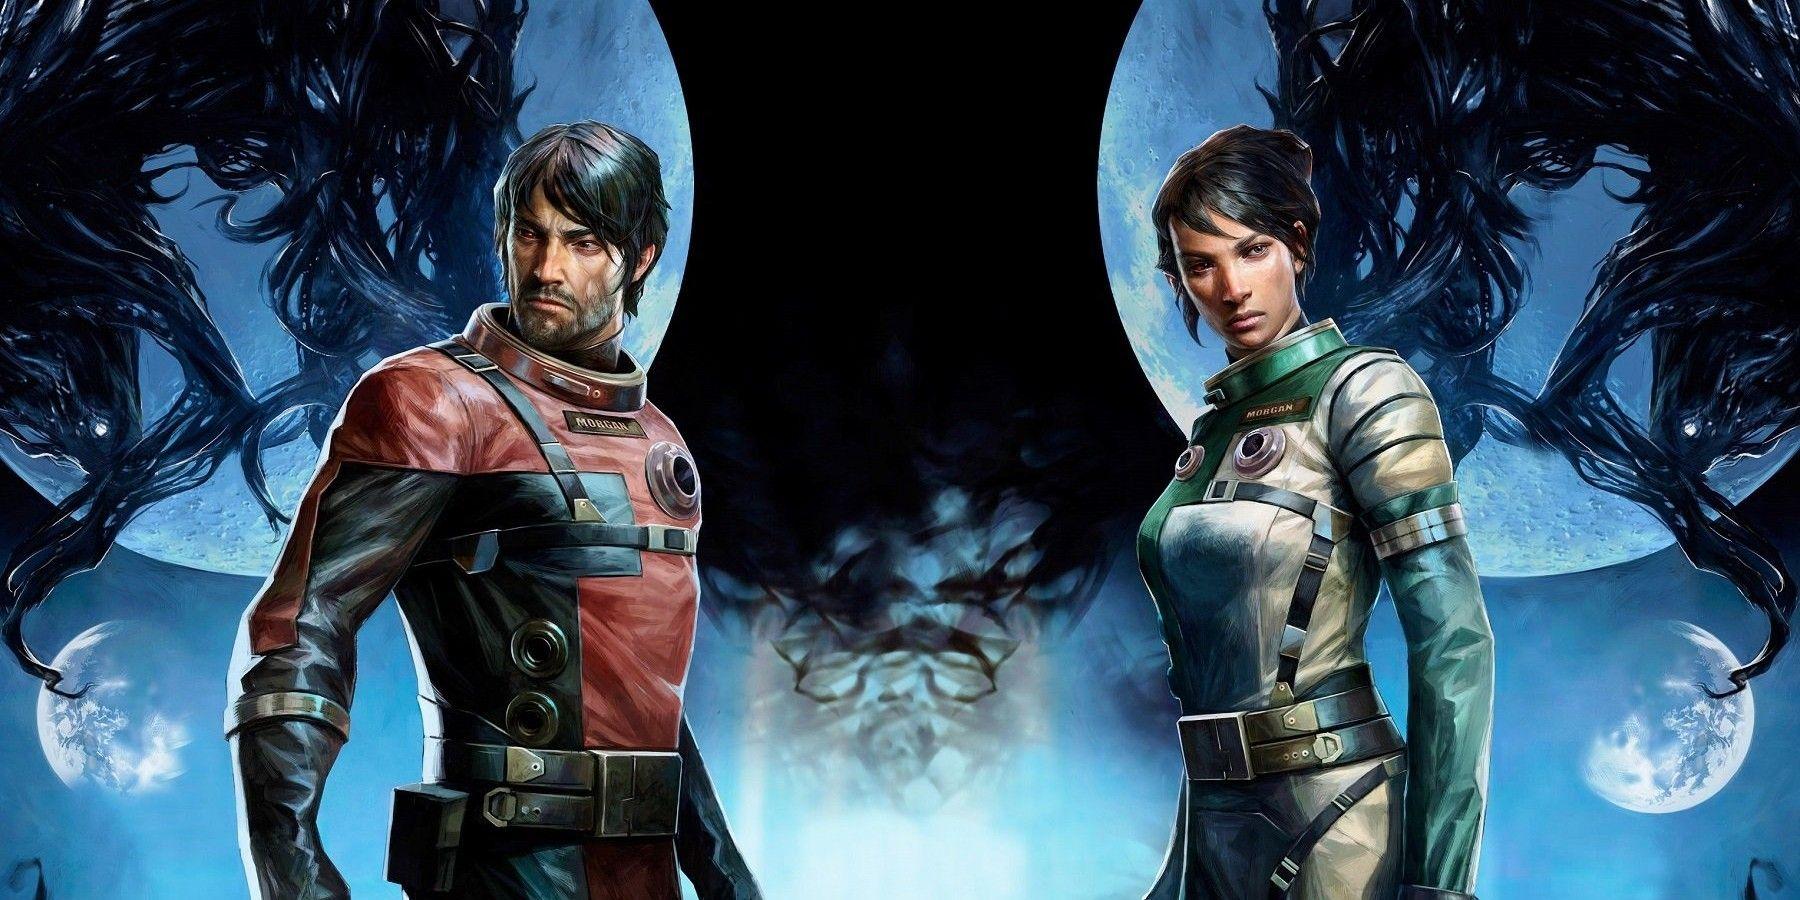 Dishonored, Prey Dev Arkane Studios Hiring For New AAA Game